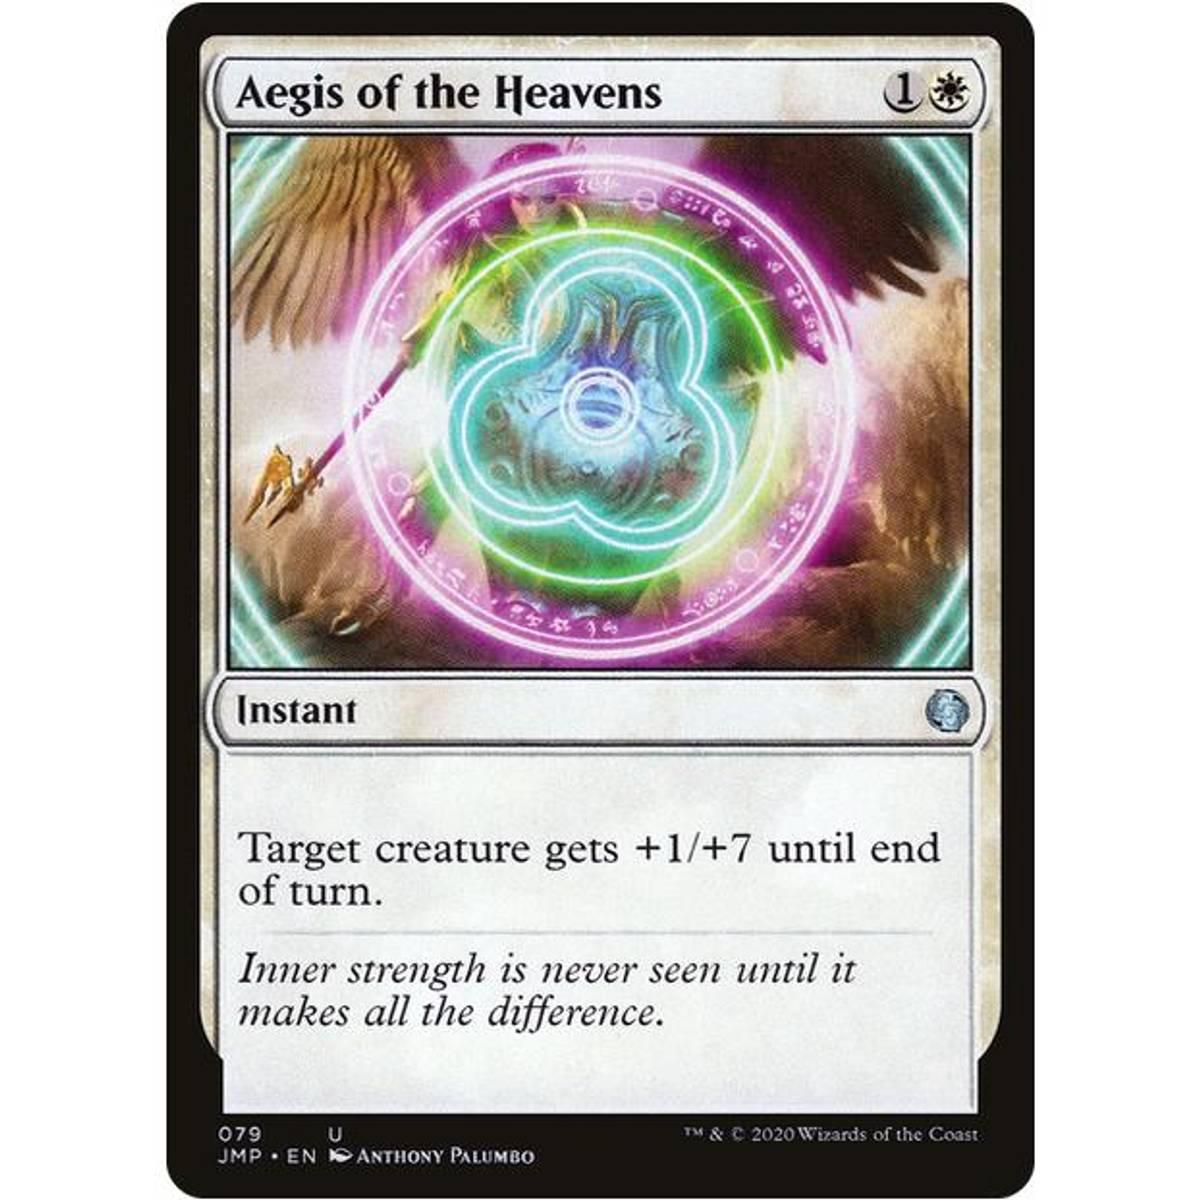 Aegis of the Heavens